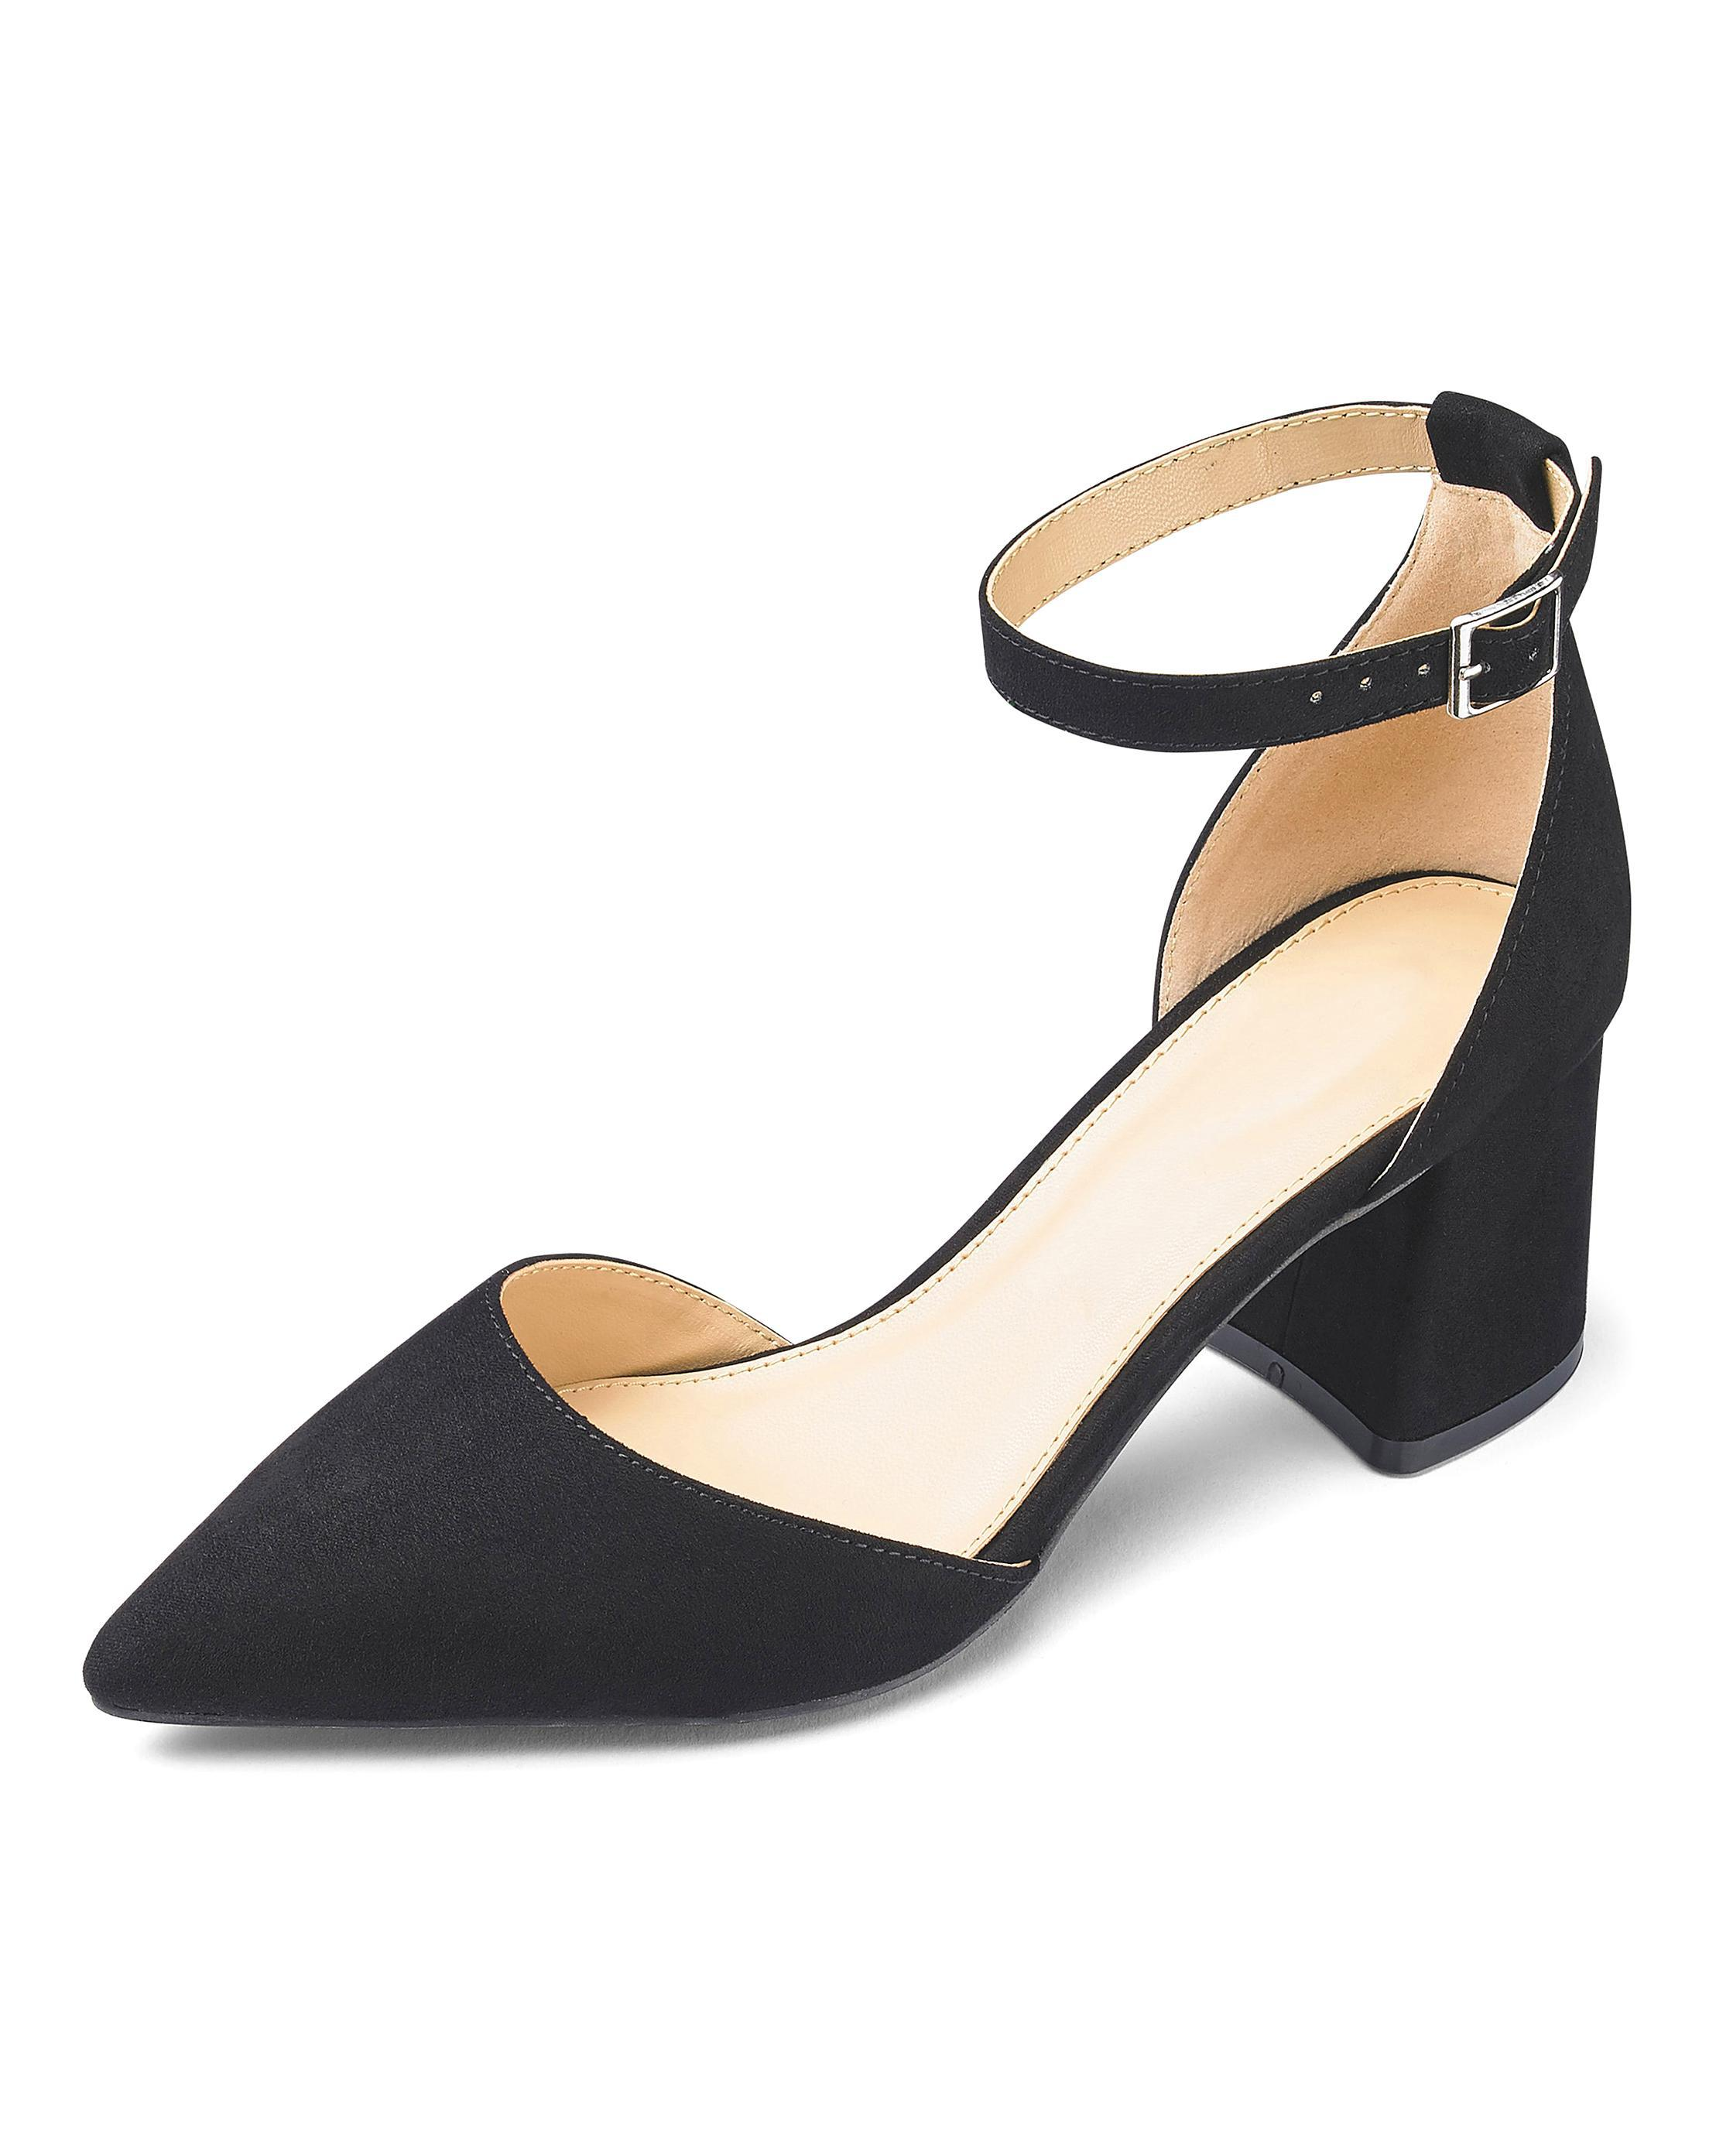 f69a492459c Lyst - Simply Be Este Pointed Block Heels in Black